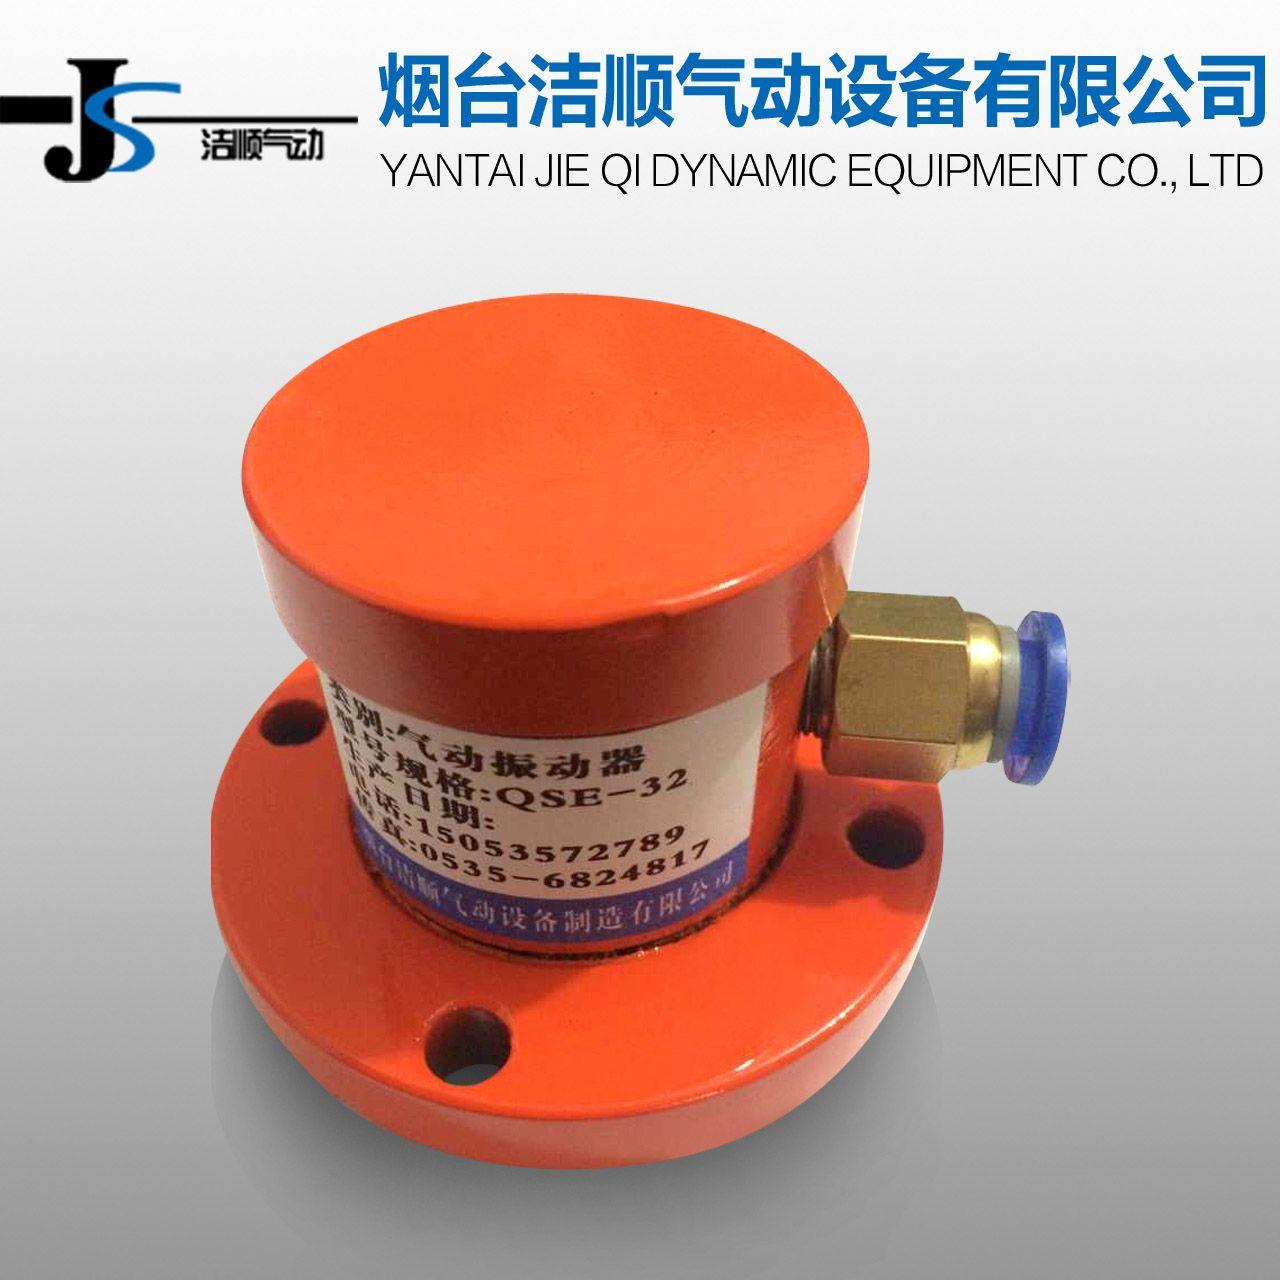 QSE系列微型振动器